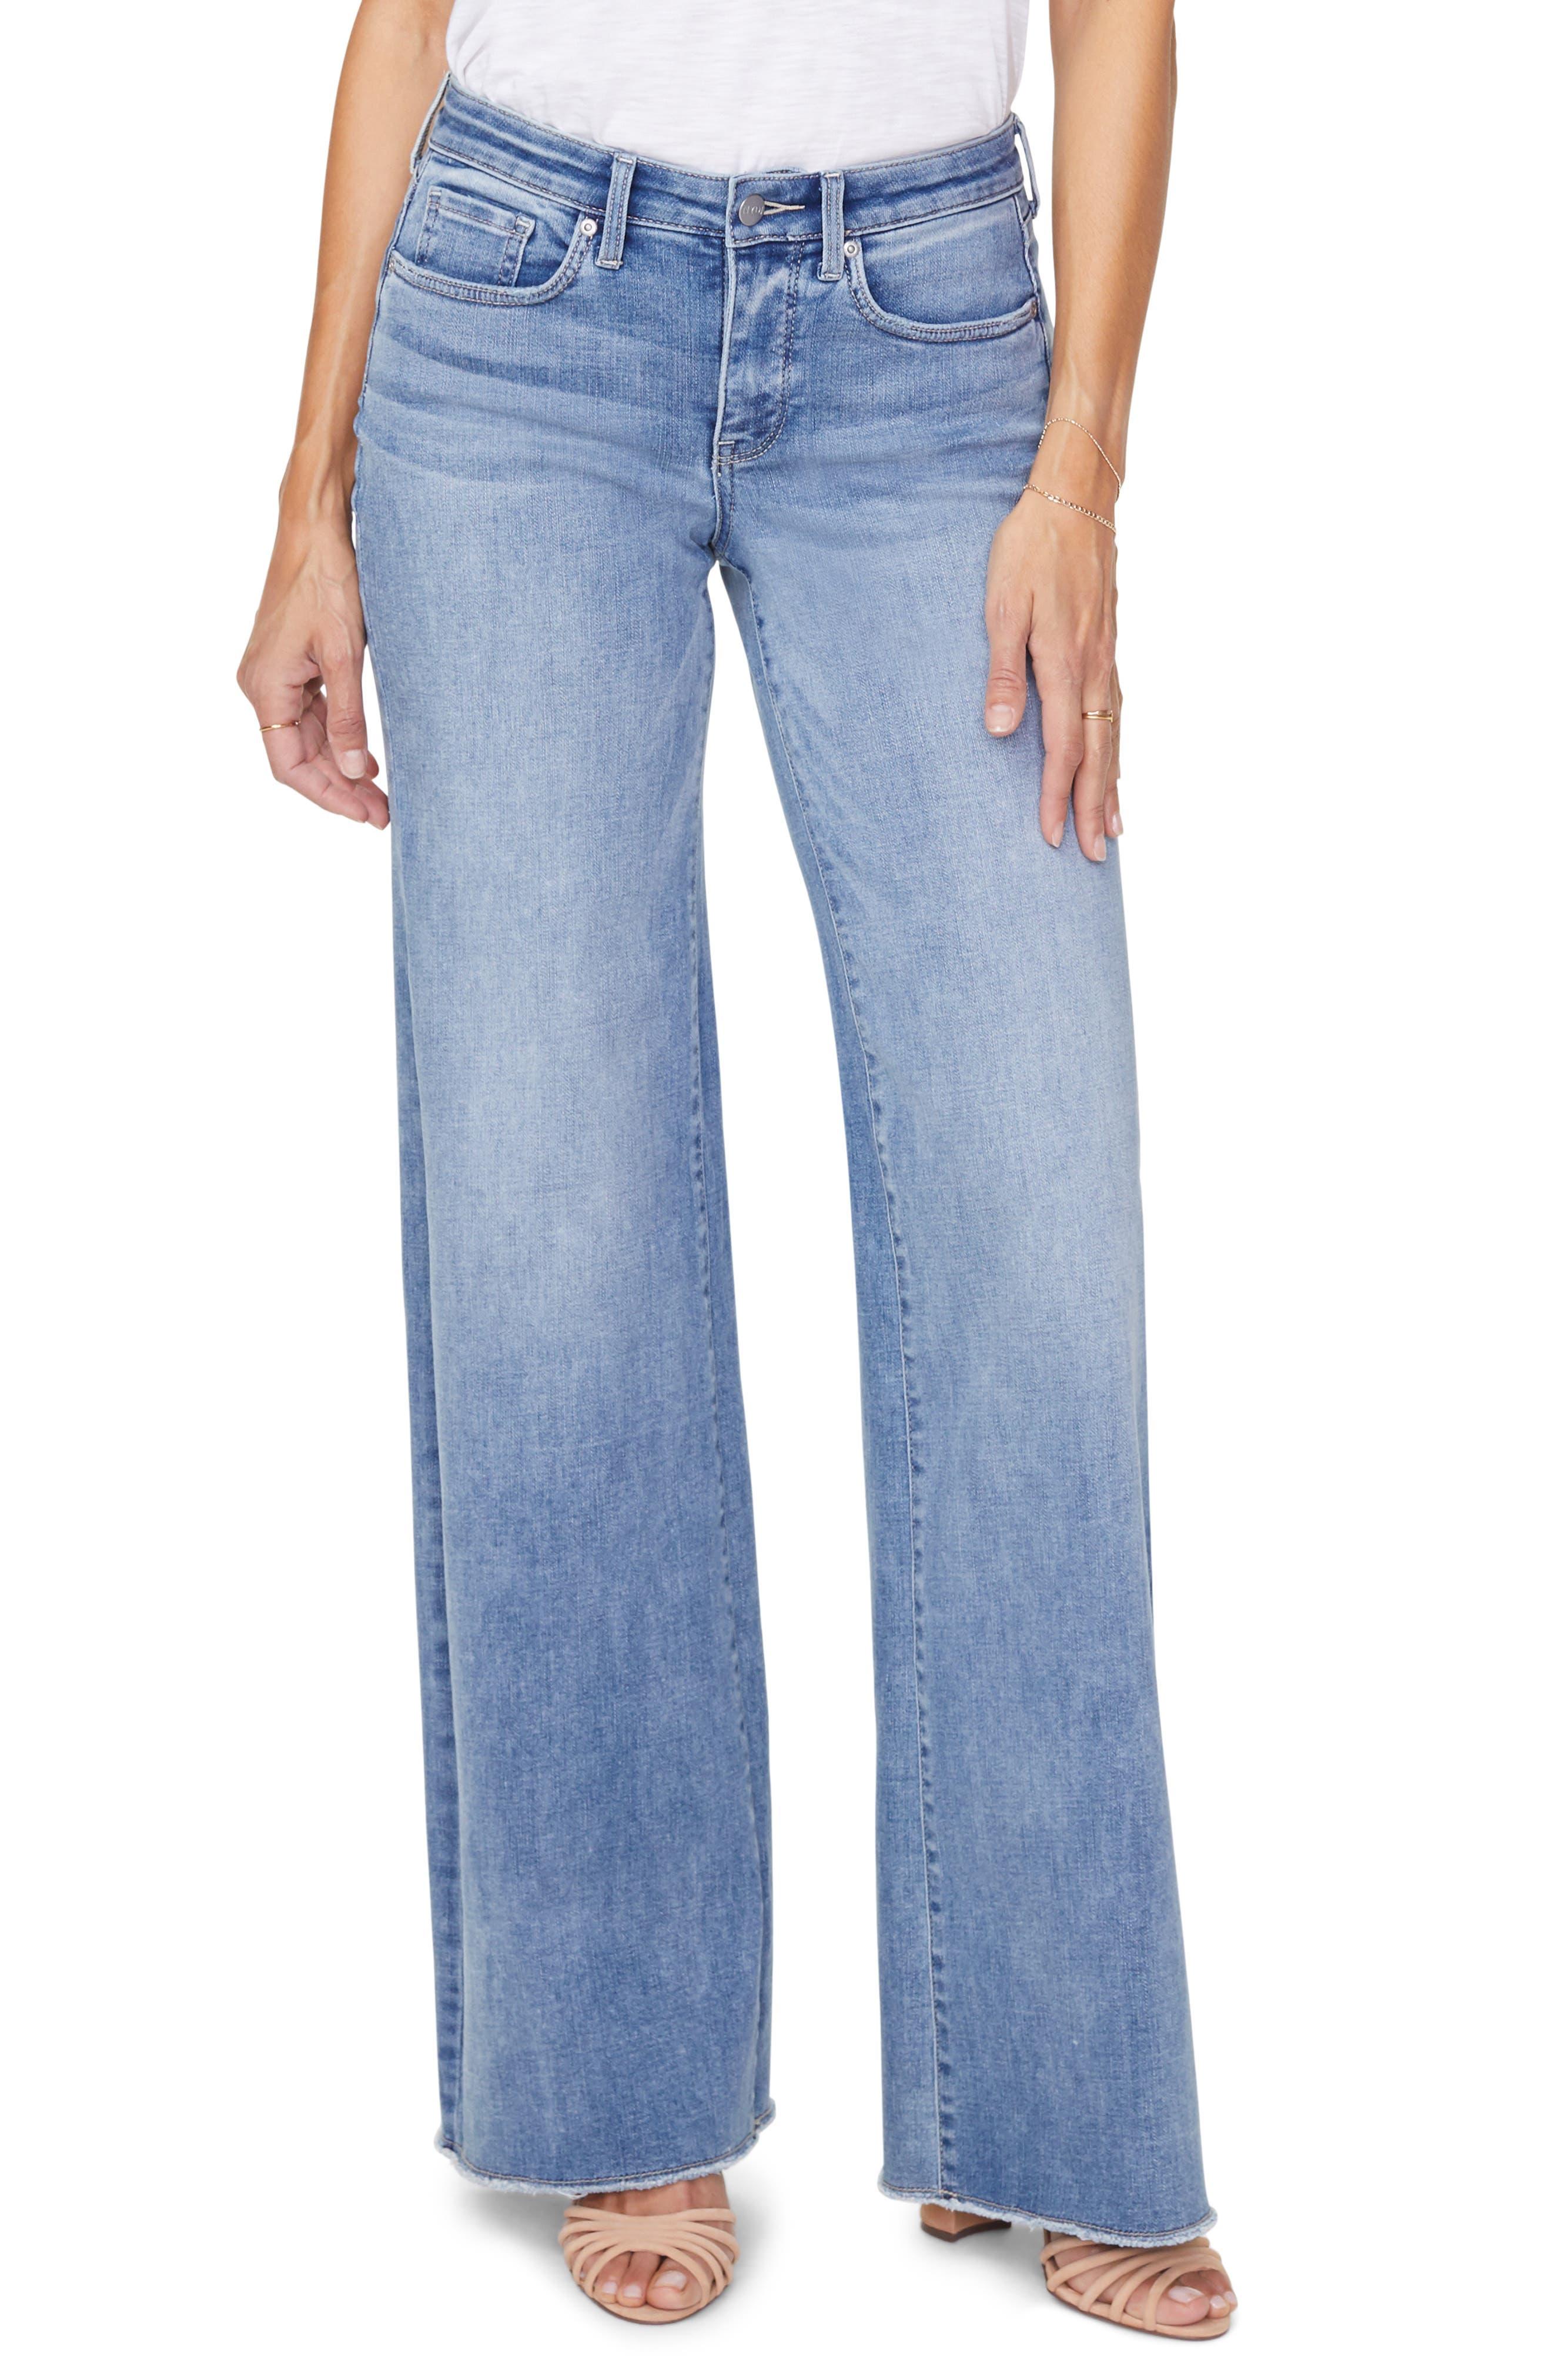 Petite Women's NYDJ Teresa Fray Hem Wide Leg Jeans